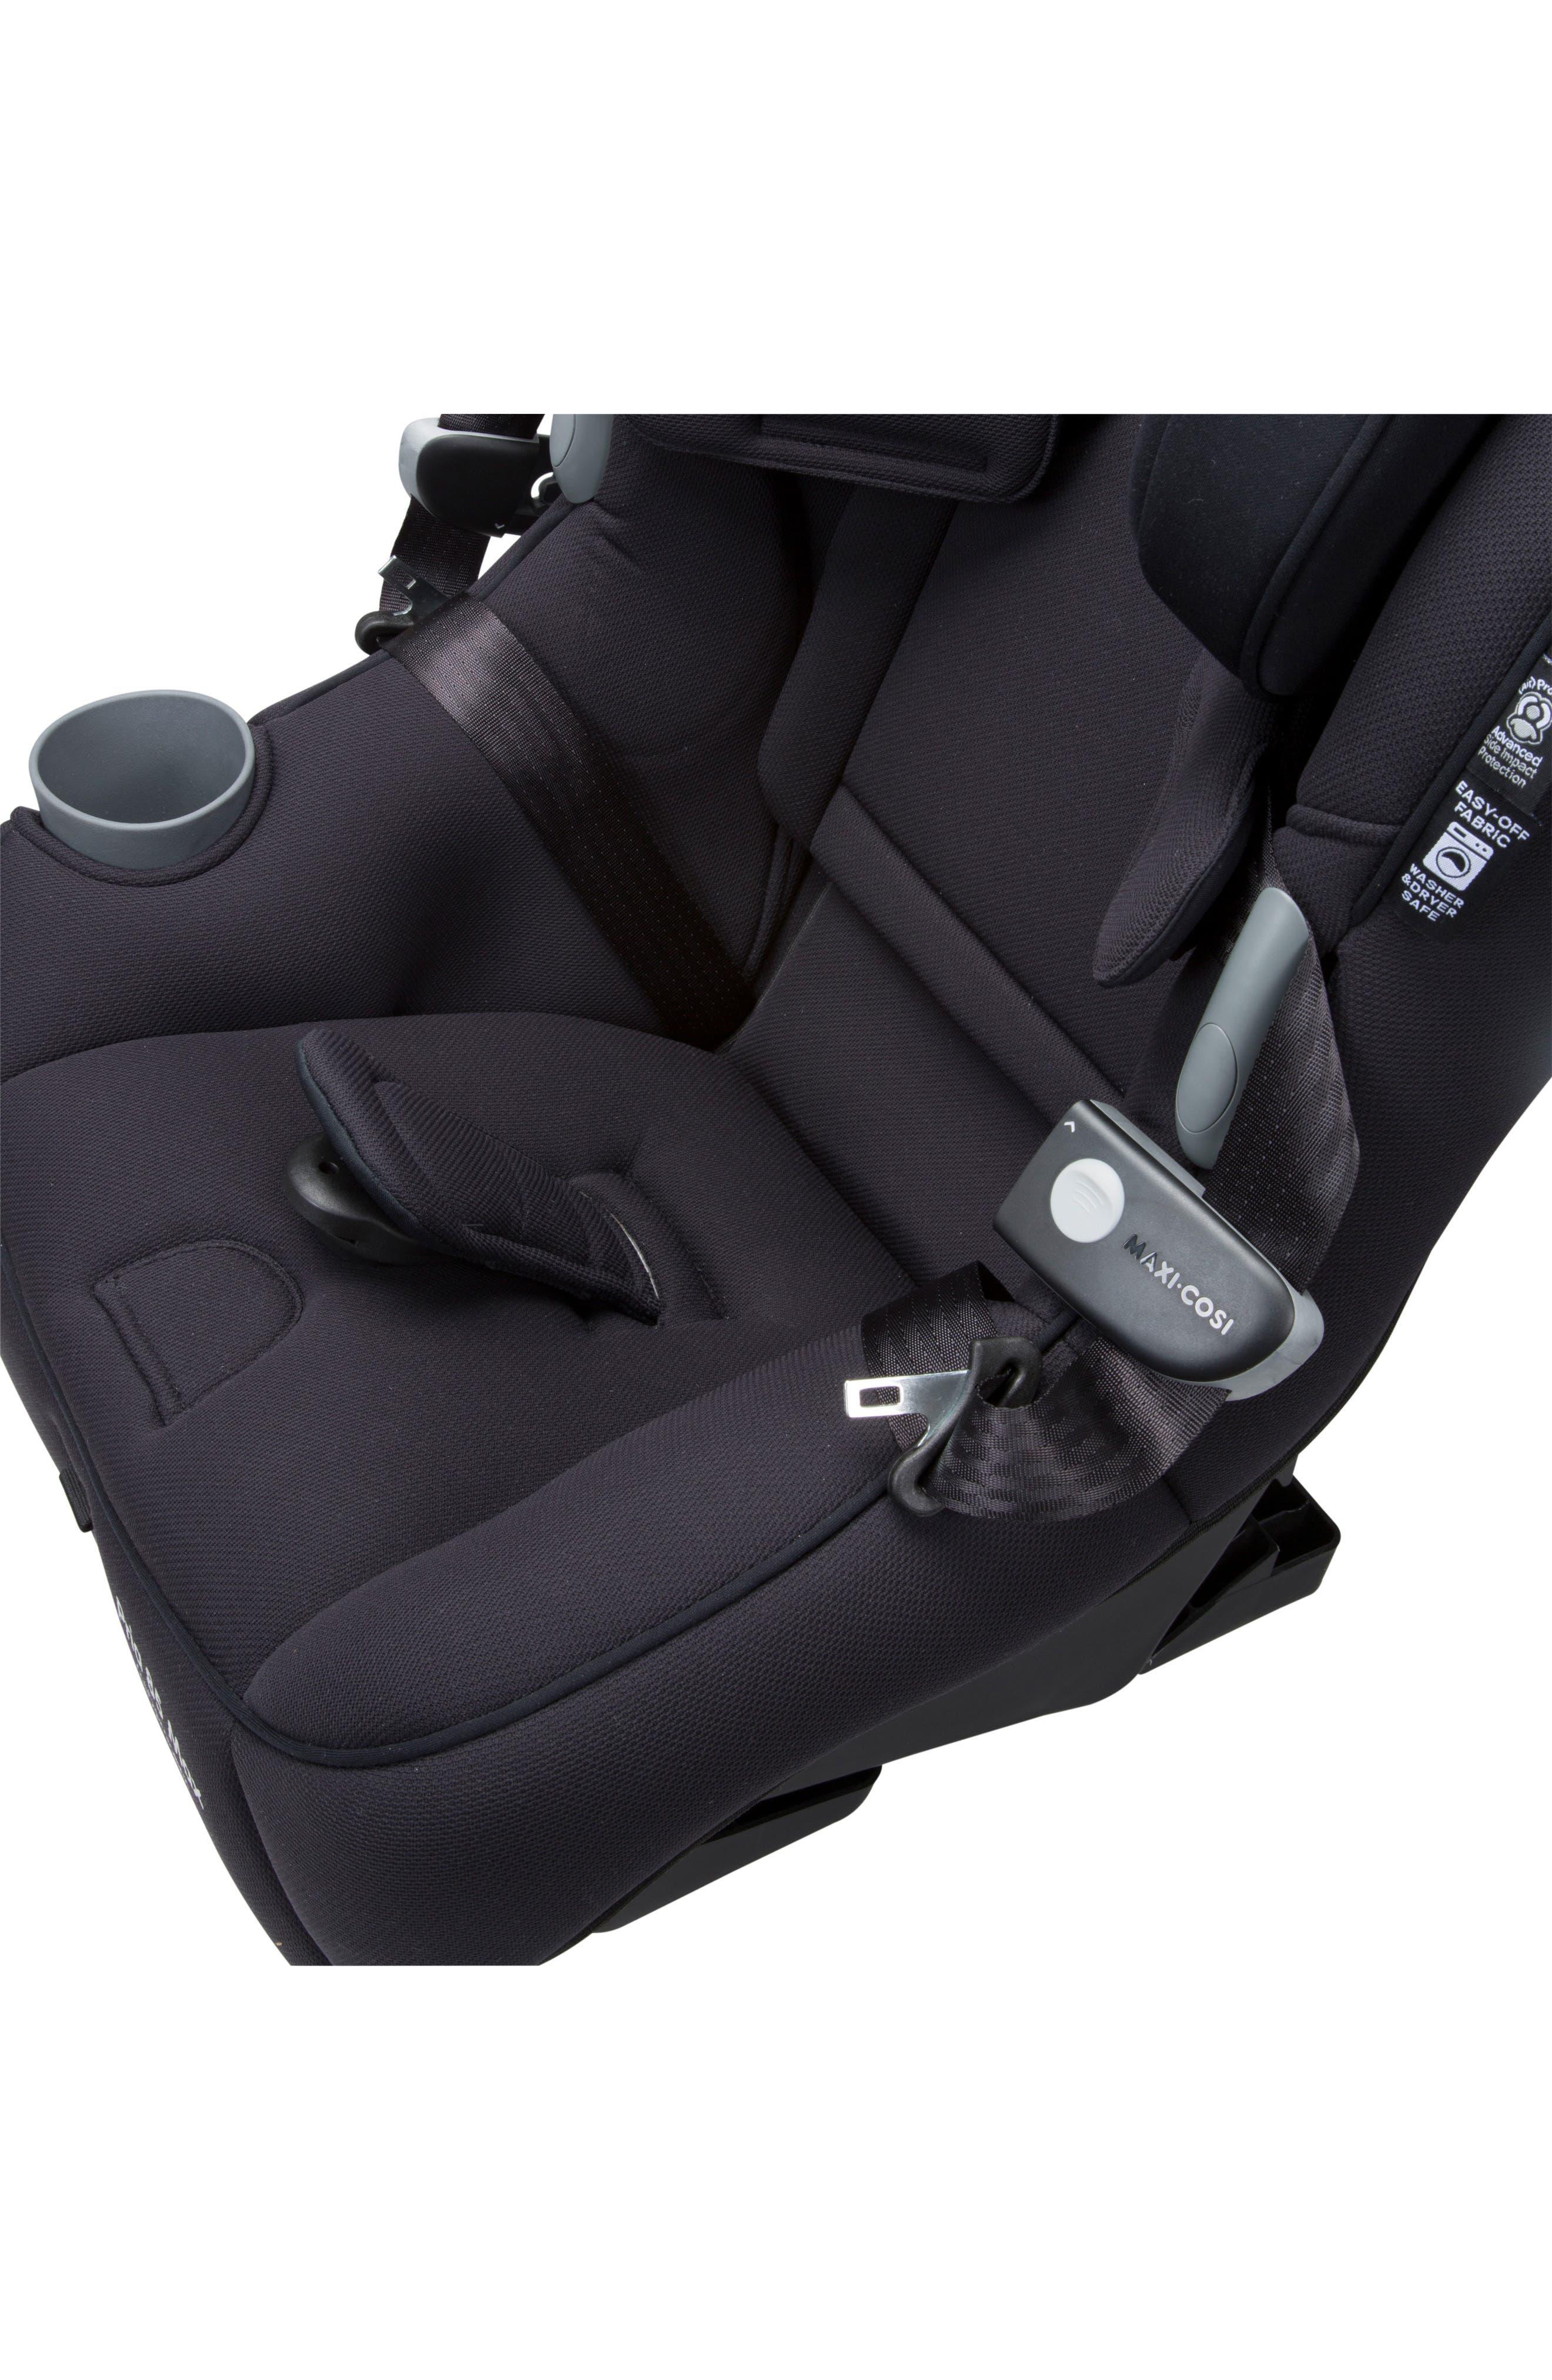 Pria<sup>™</sup> 85 Max Convertible Car Seat,                             Alternate thumbnail 5, color,                             NIGHT BLACK